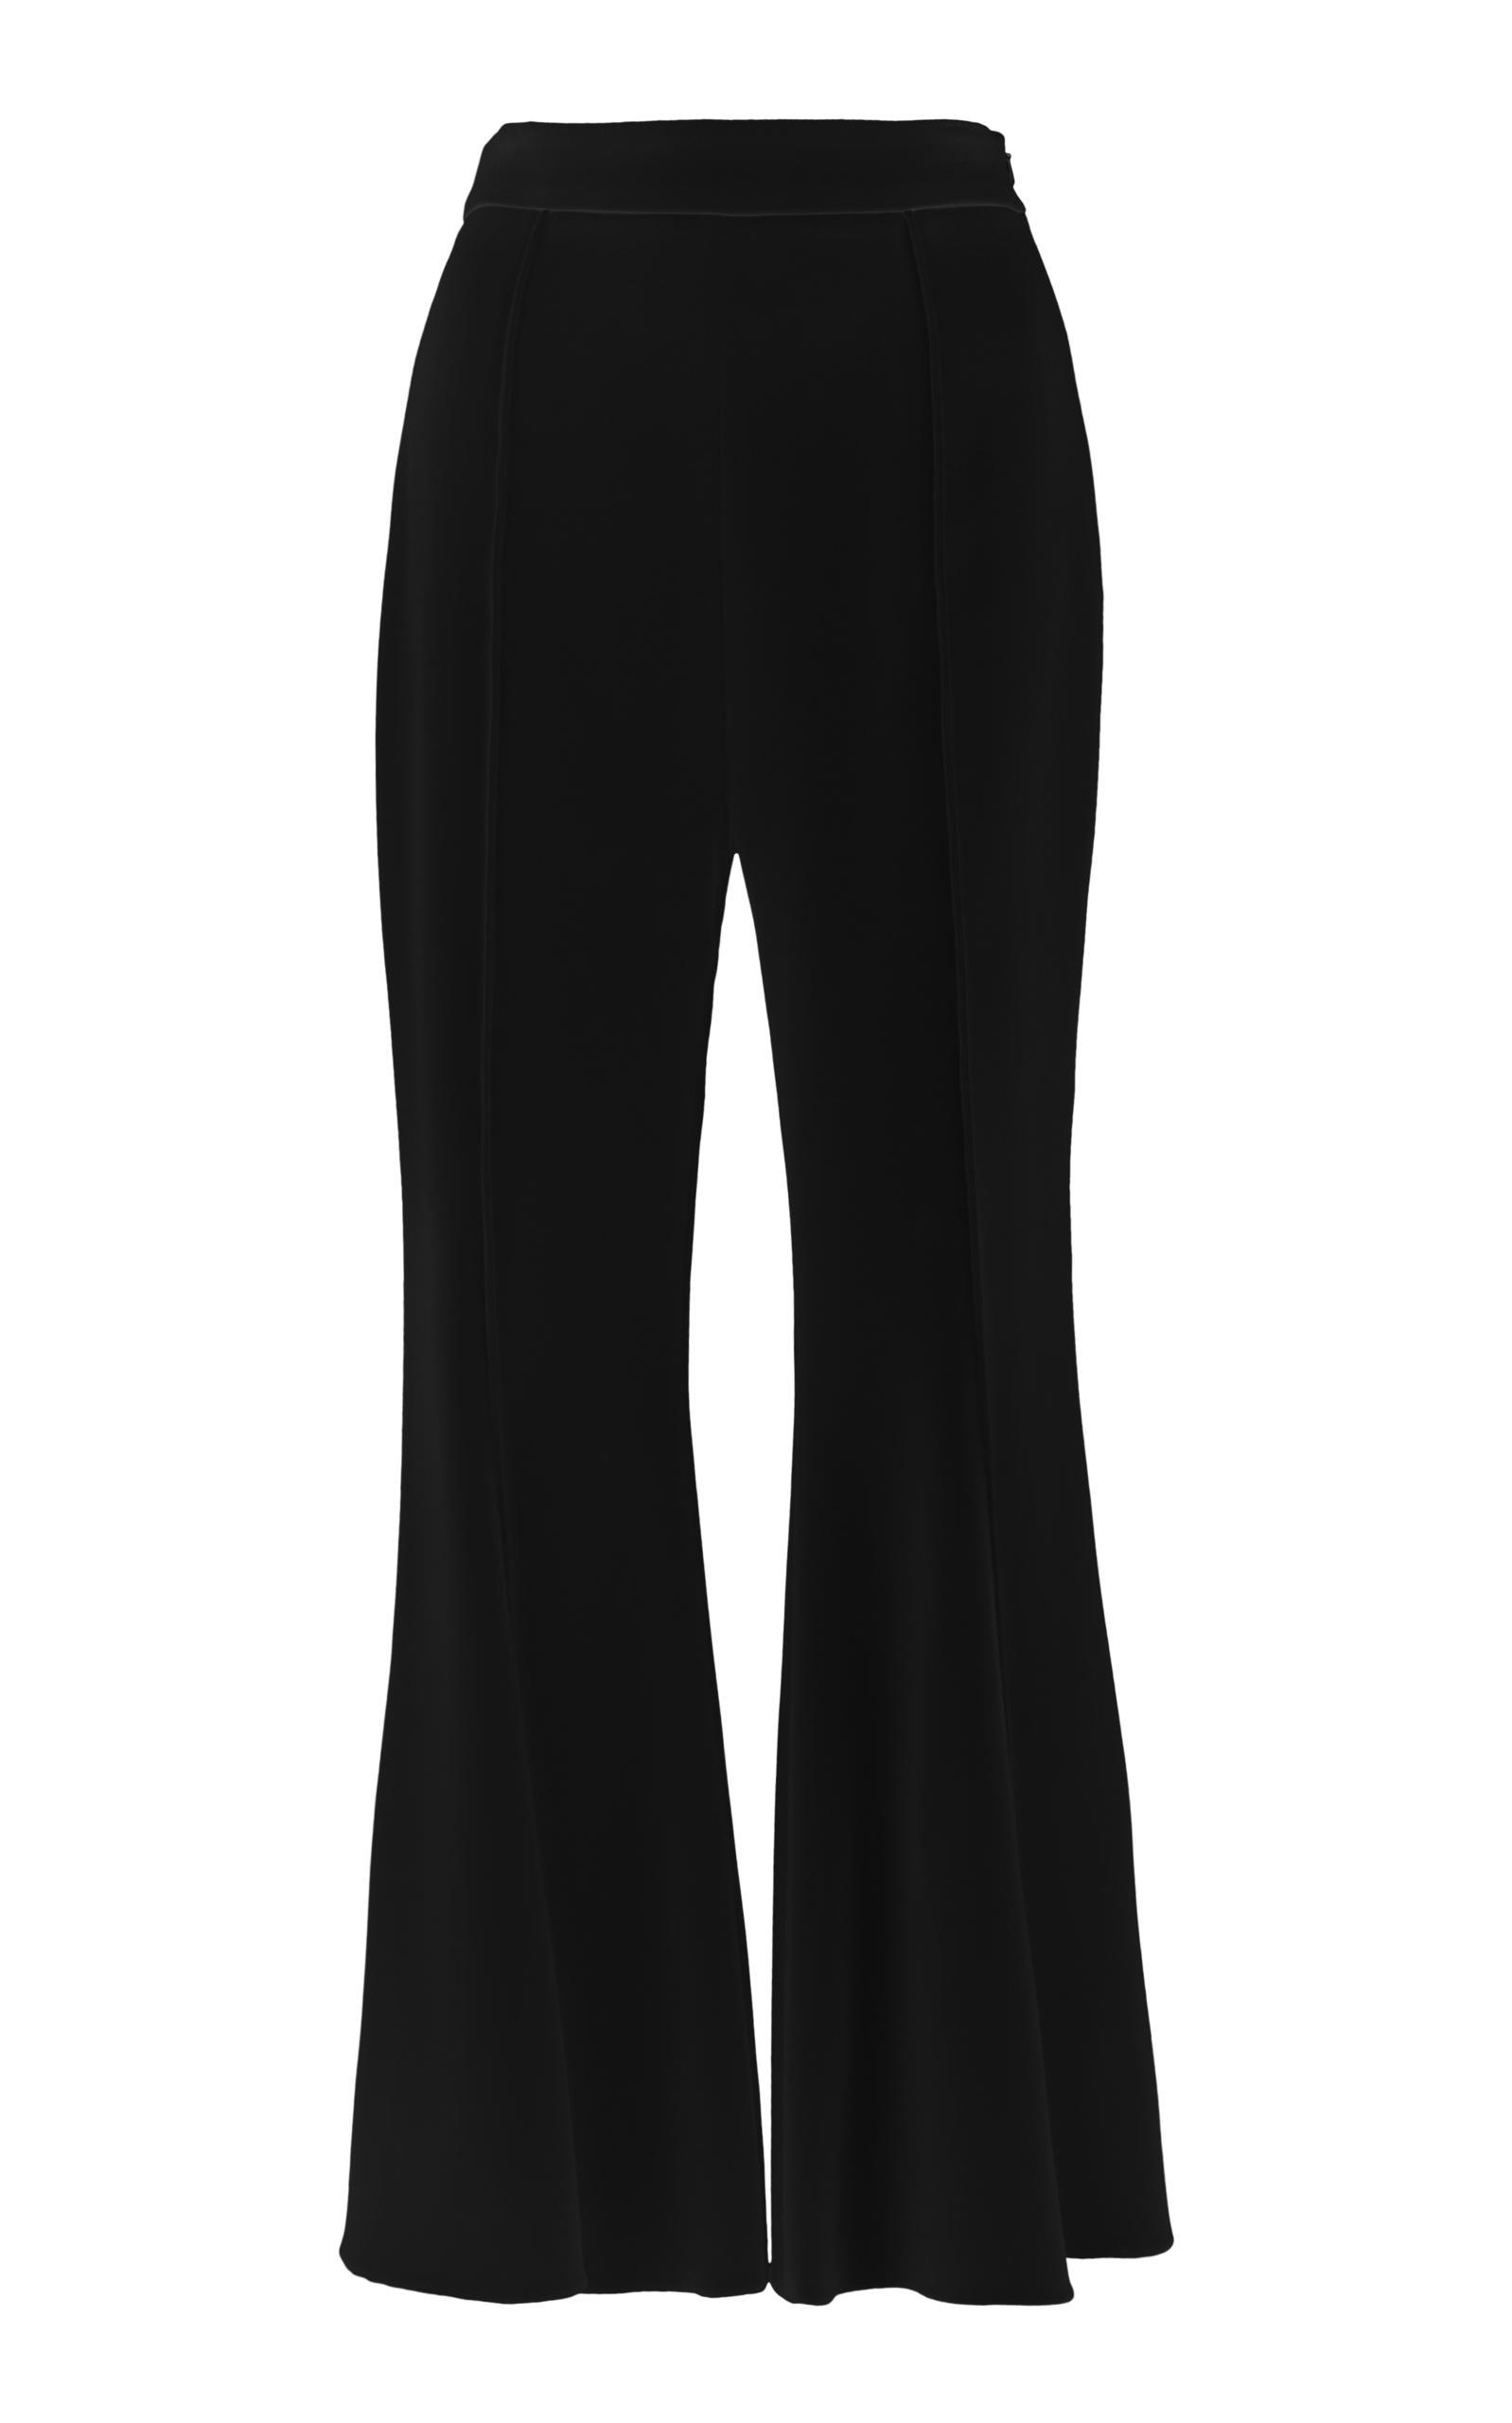 Cushnie Et Ochs Woman Cropped Crepe Flared Pants Black In White